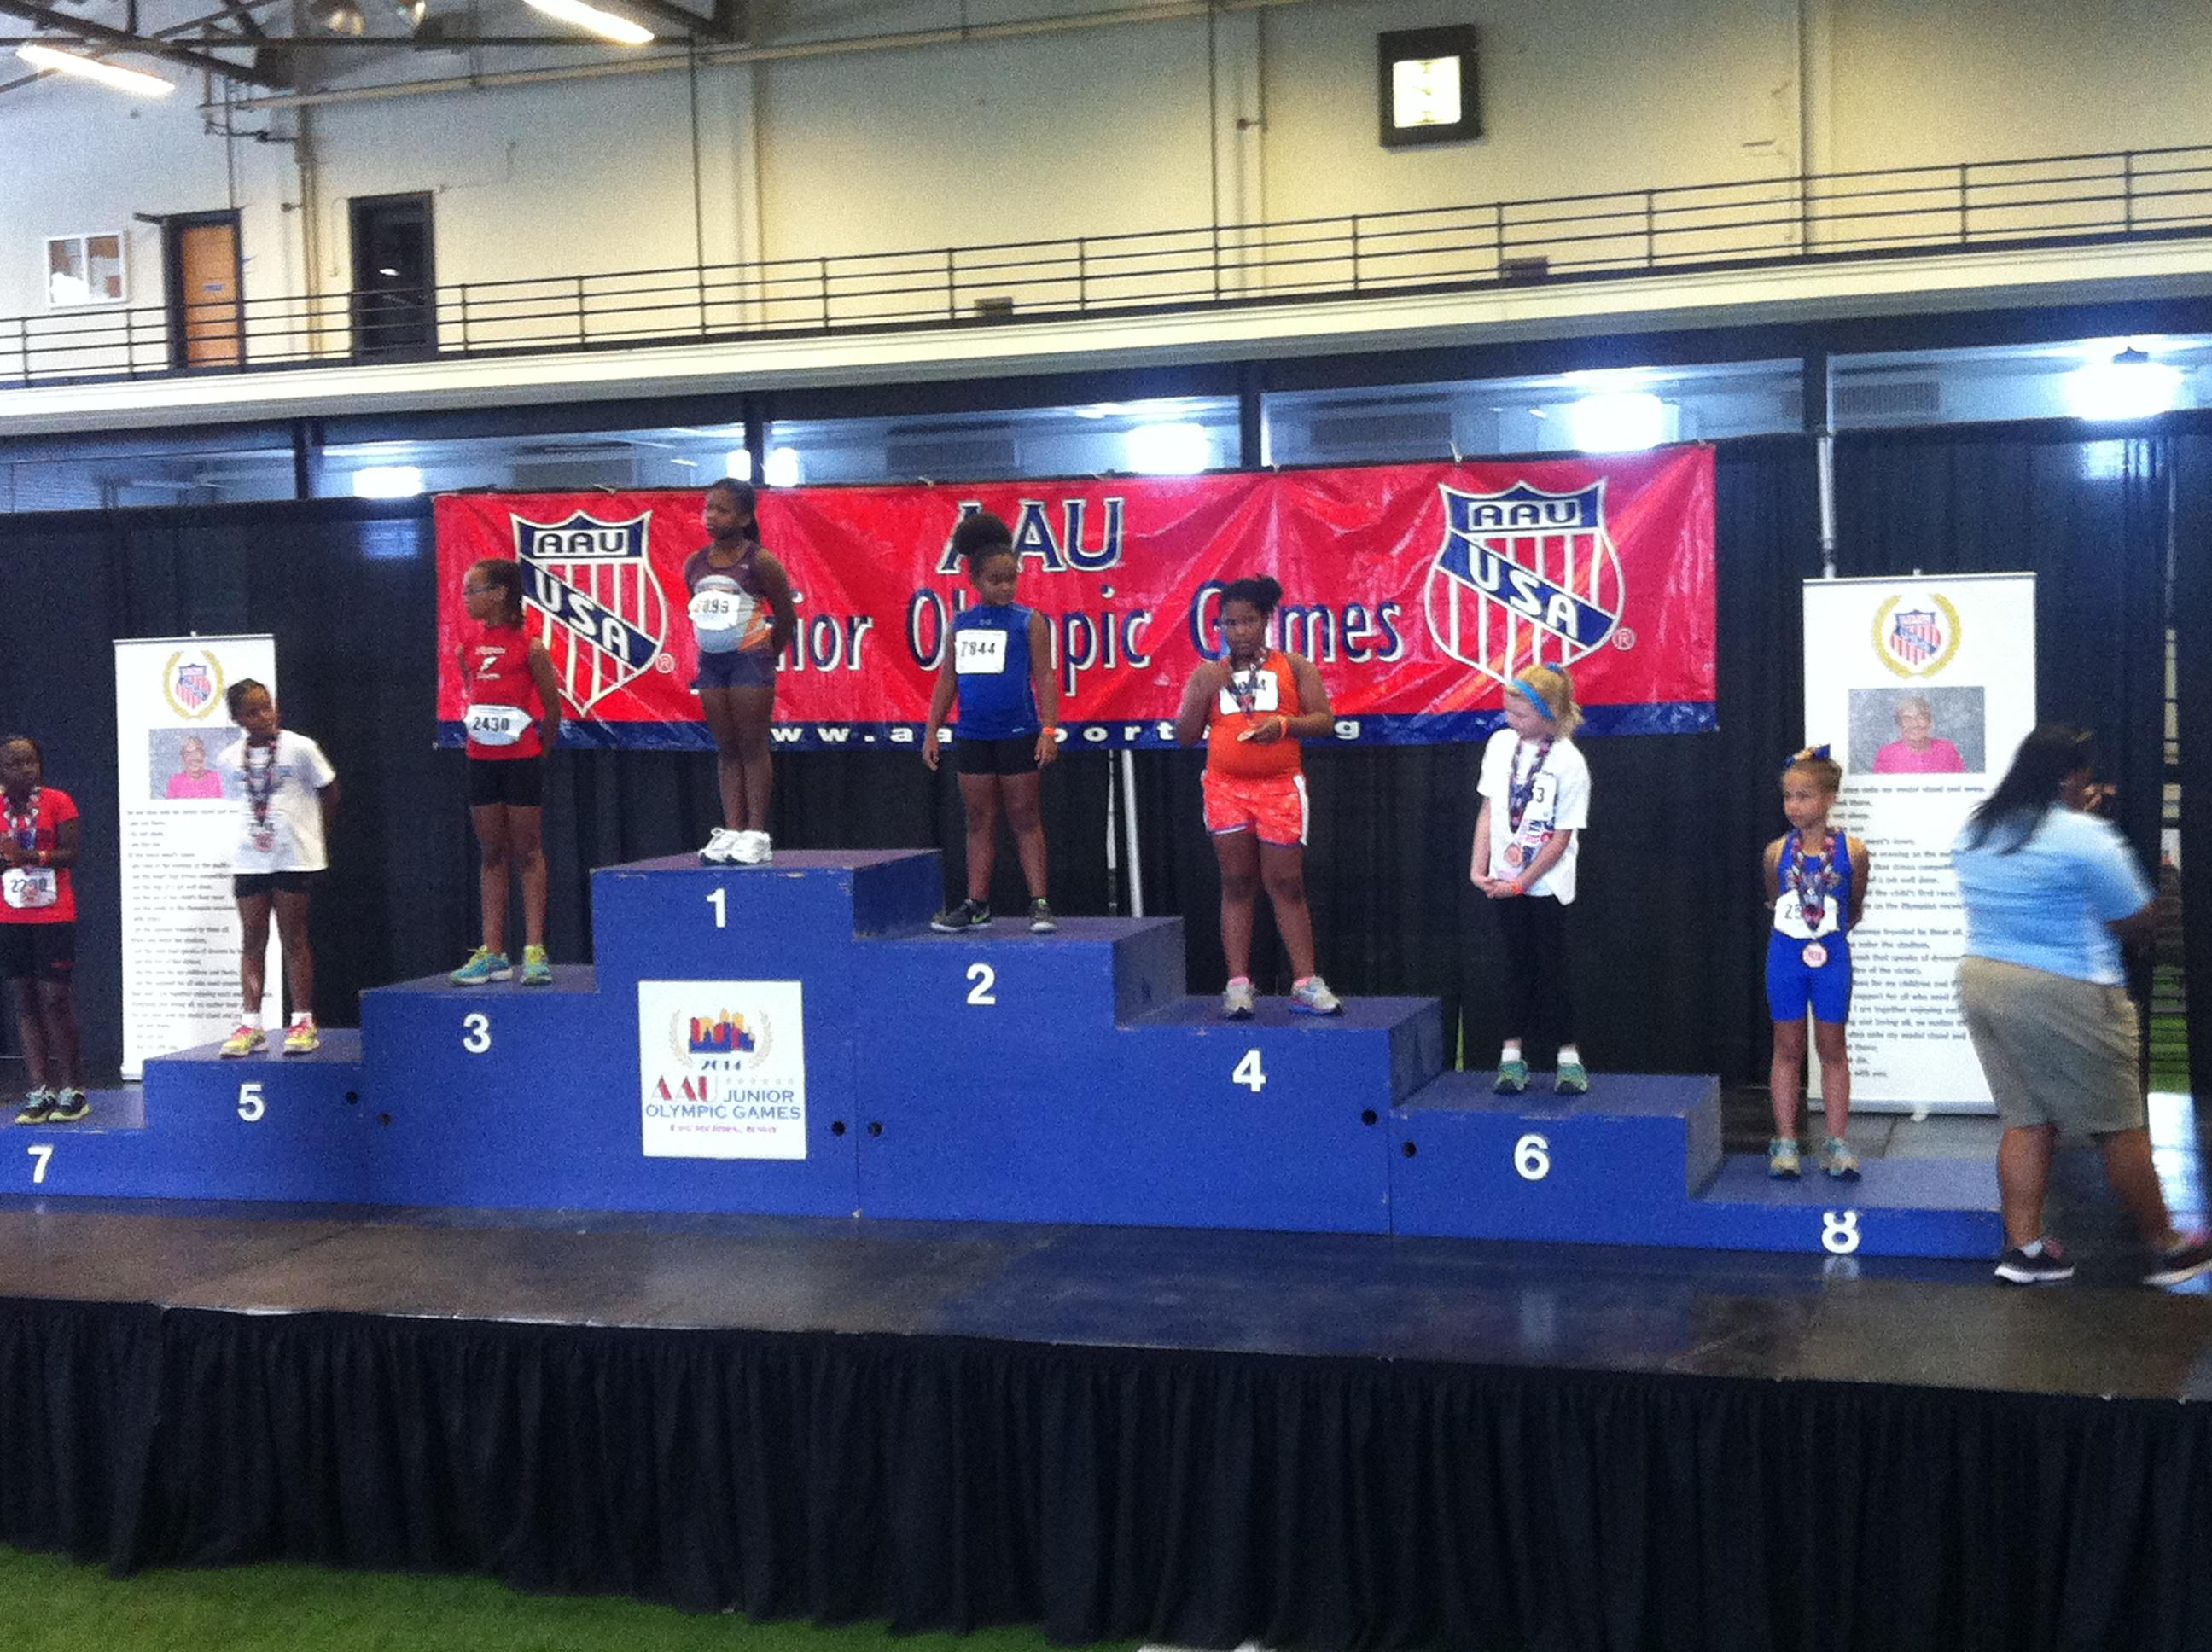 Octavia on the podium for the shot put